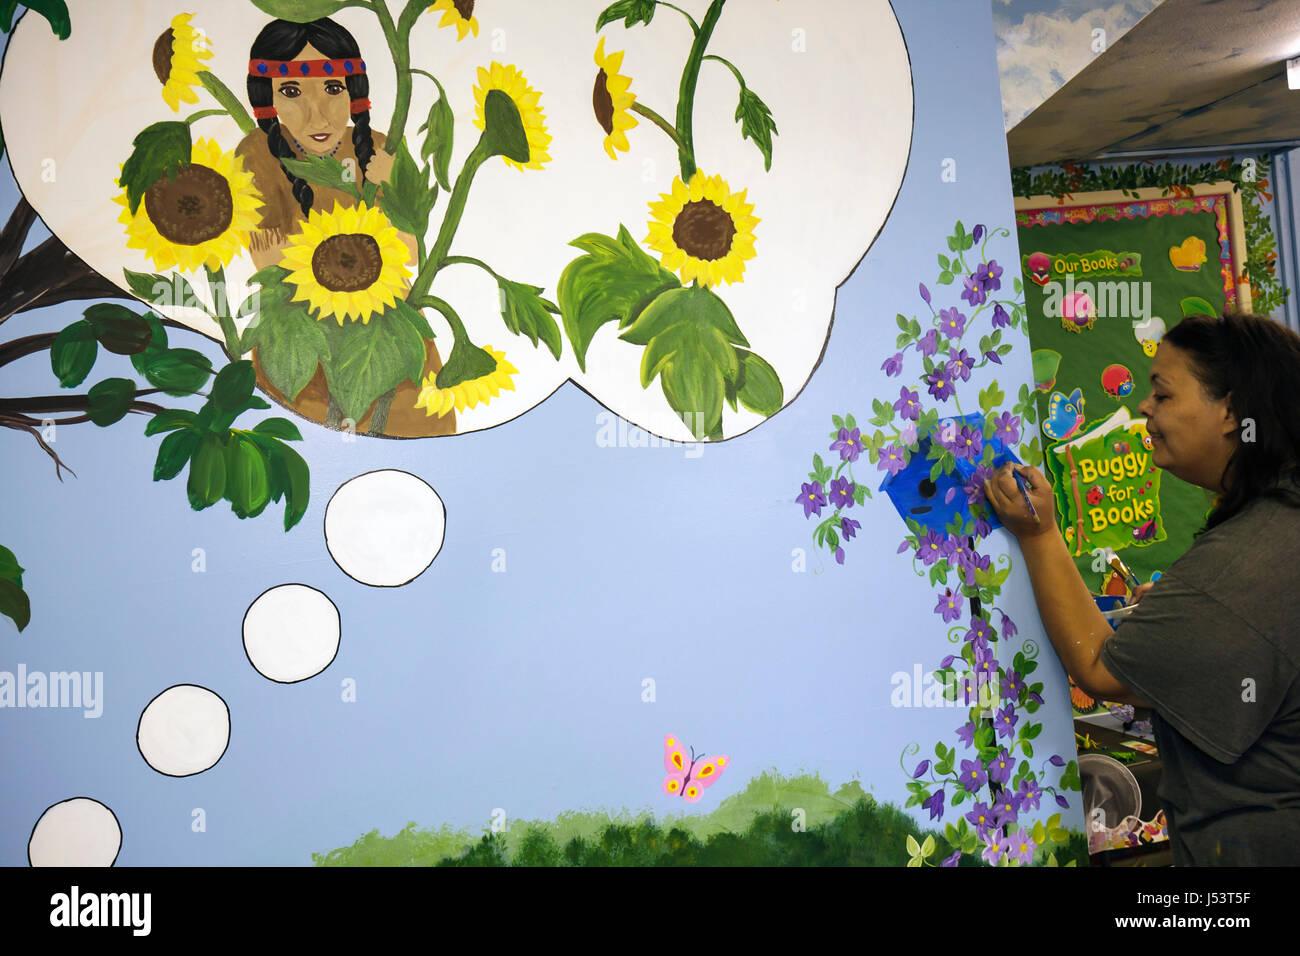 Arkansas Pocahontas Randolph County Library muralist painter Black woman artist youth children's room Native American Stock Photo